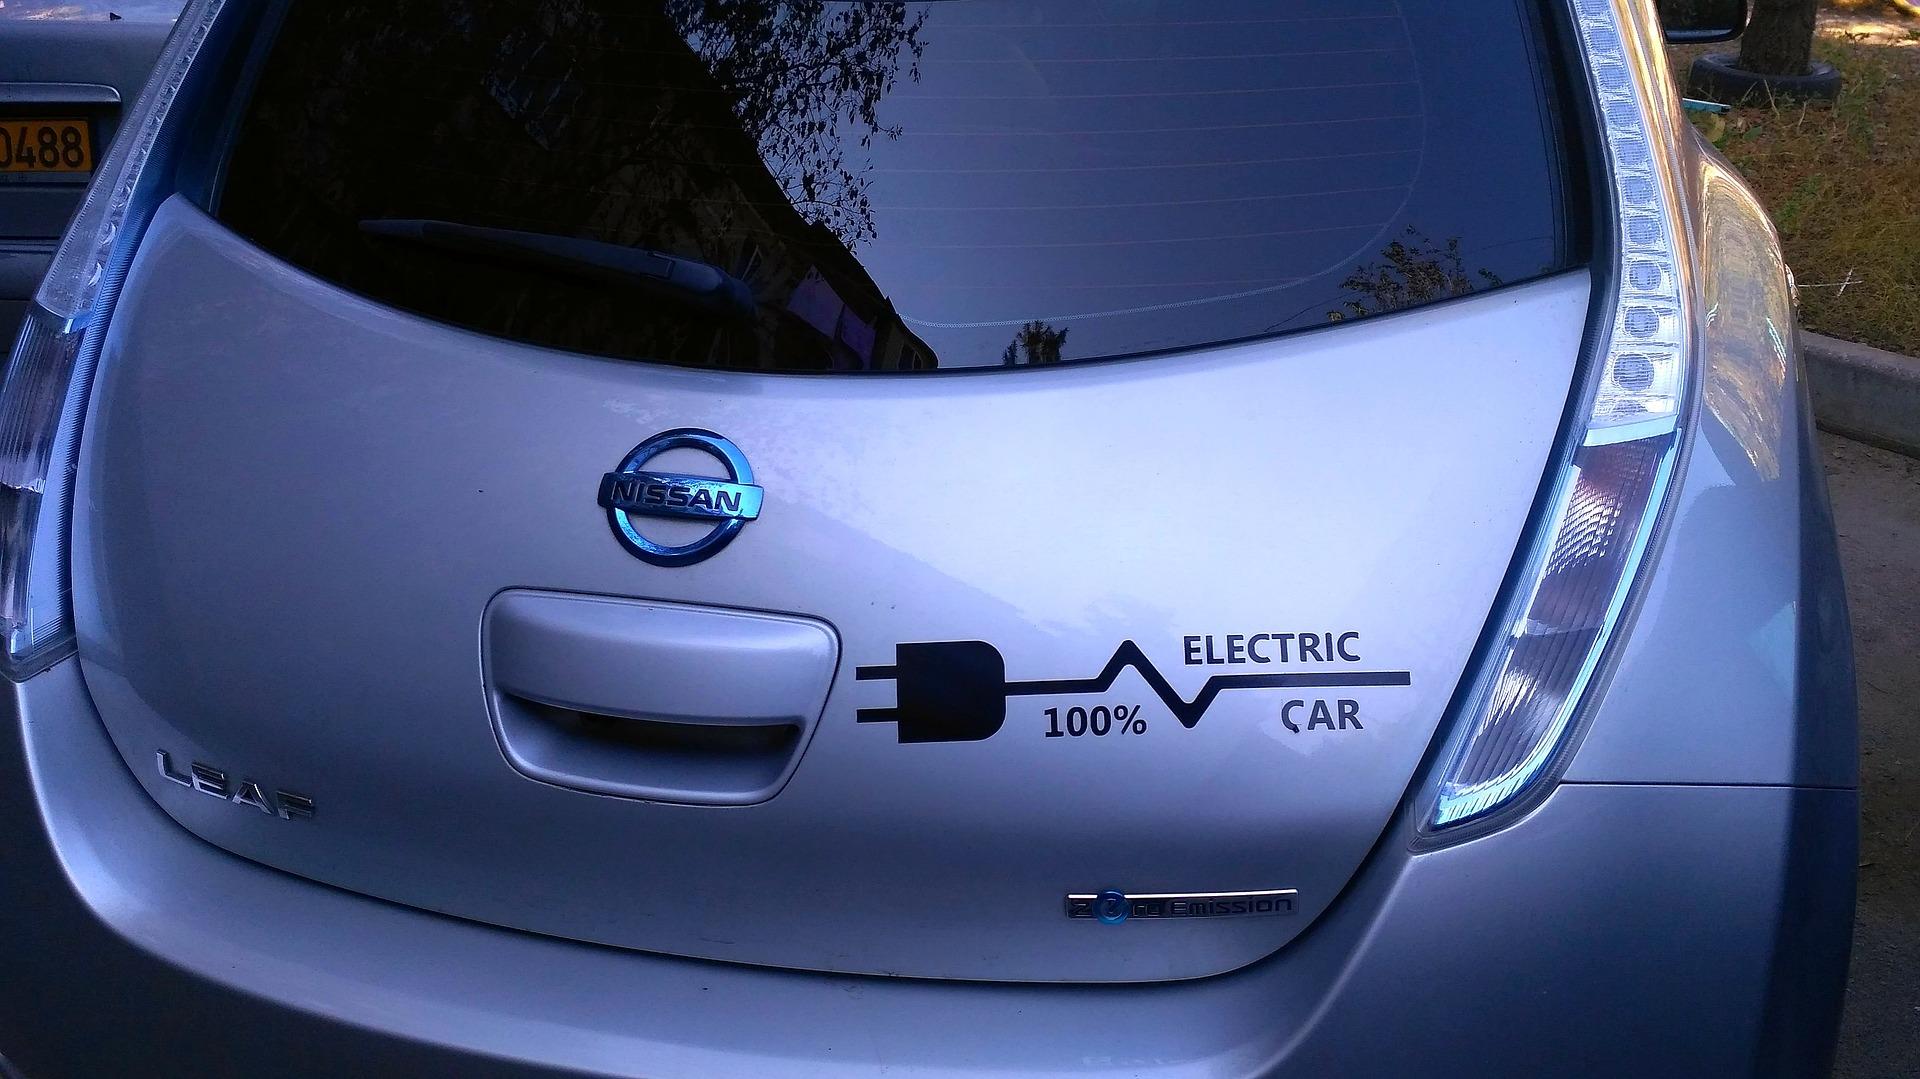 V 2017 roci u sviti prodaduť miľjonnyj elektromobiľ